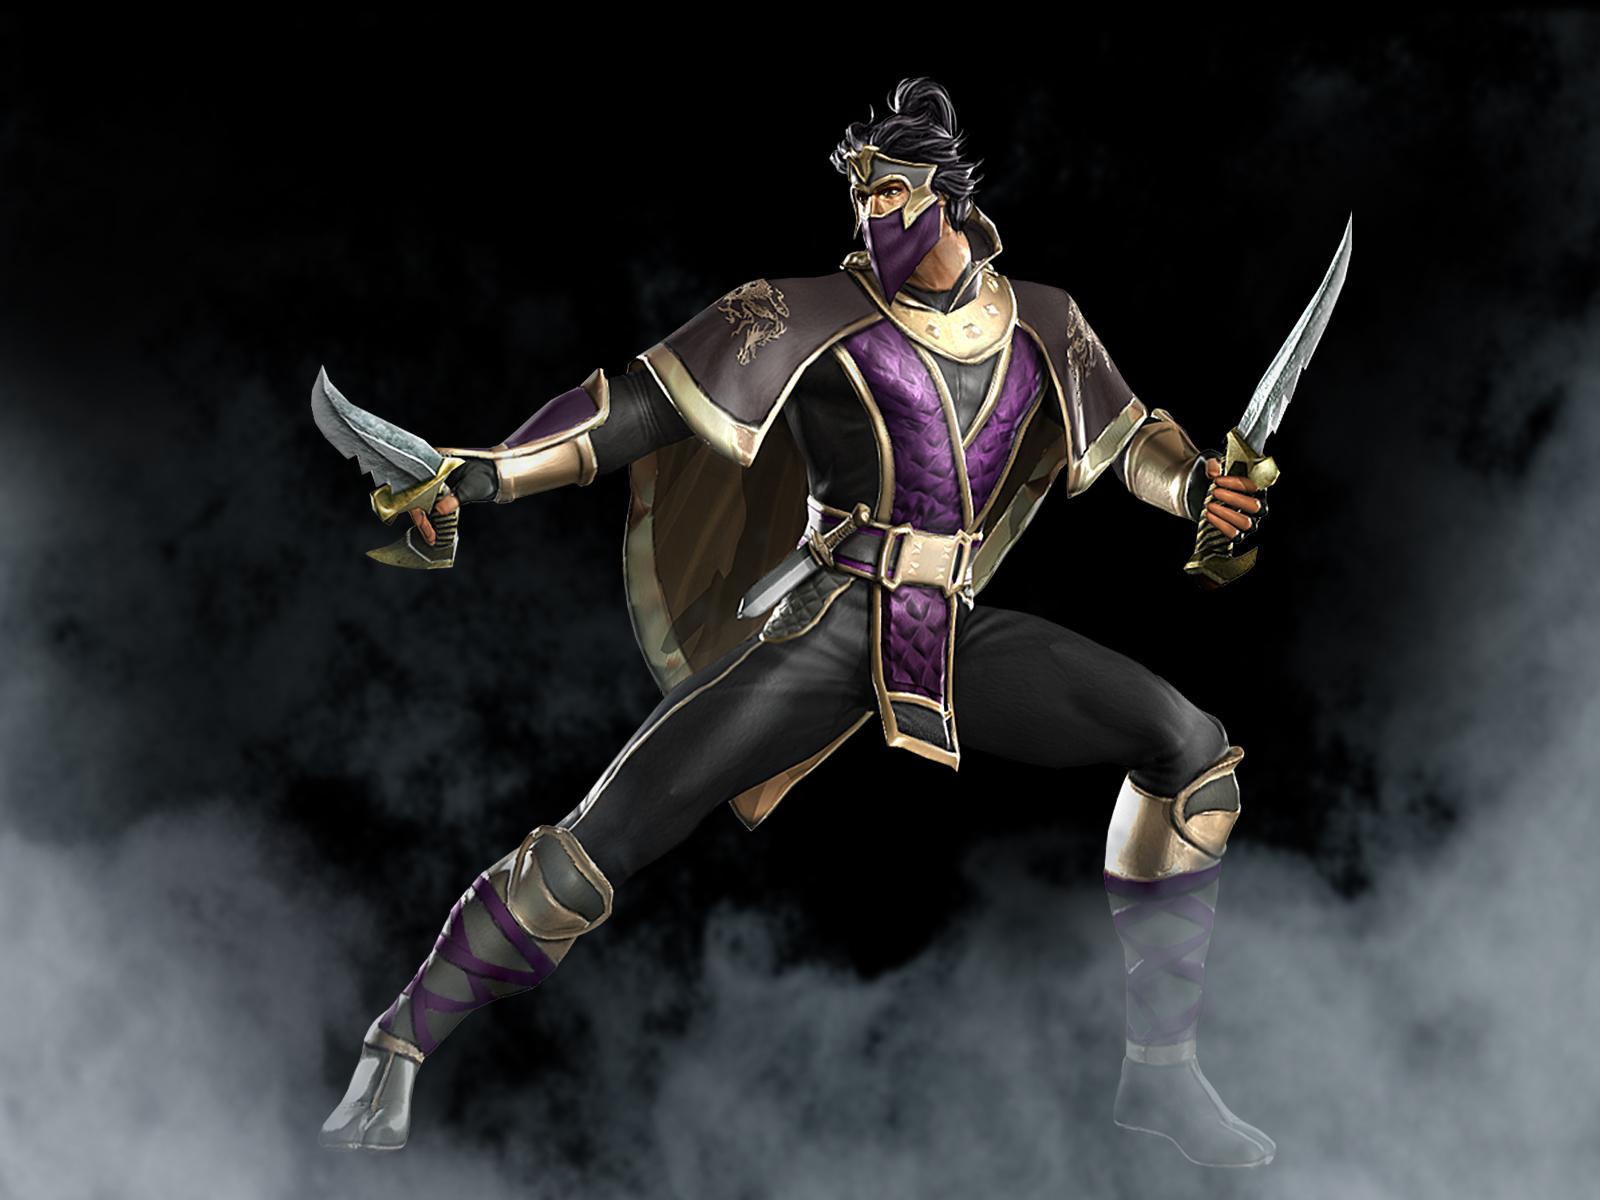 Mortal Kombat Armageddon Wallpaper